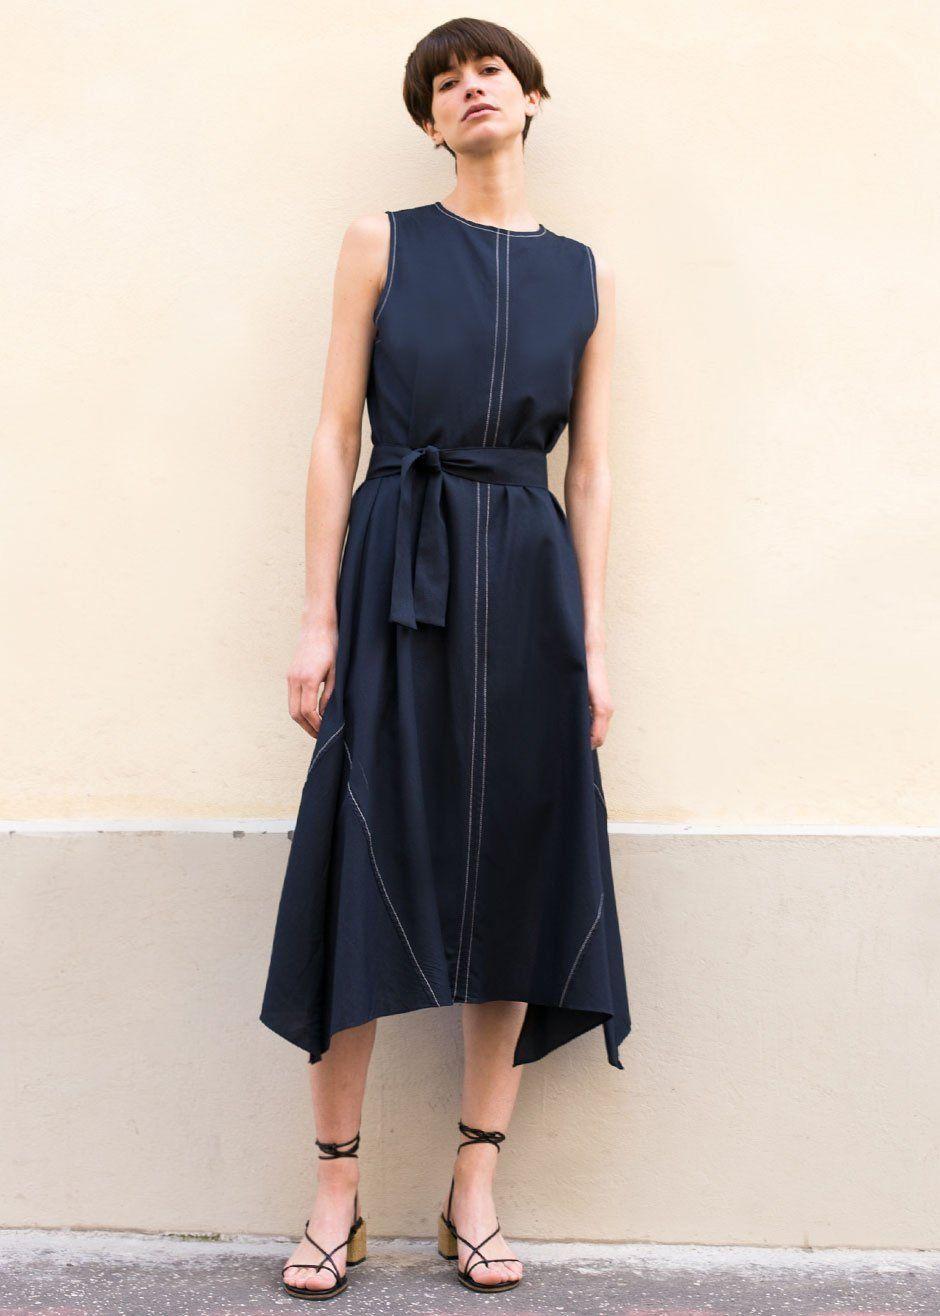 631786f4ab Sleeveless Navy Contrast Stitching Dress